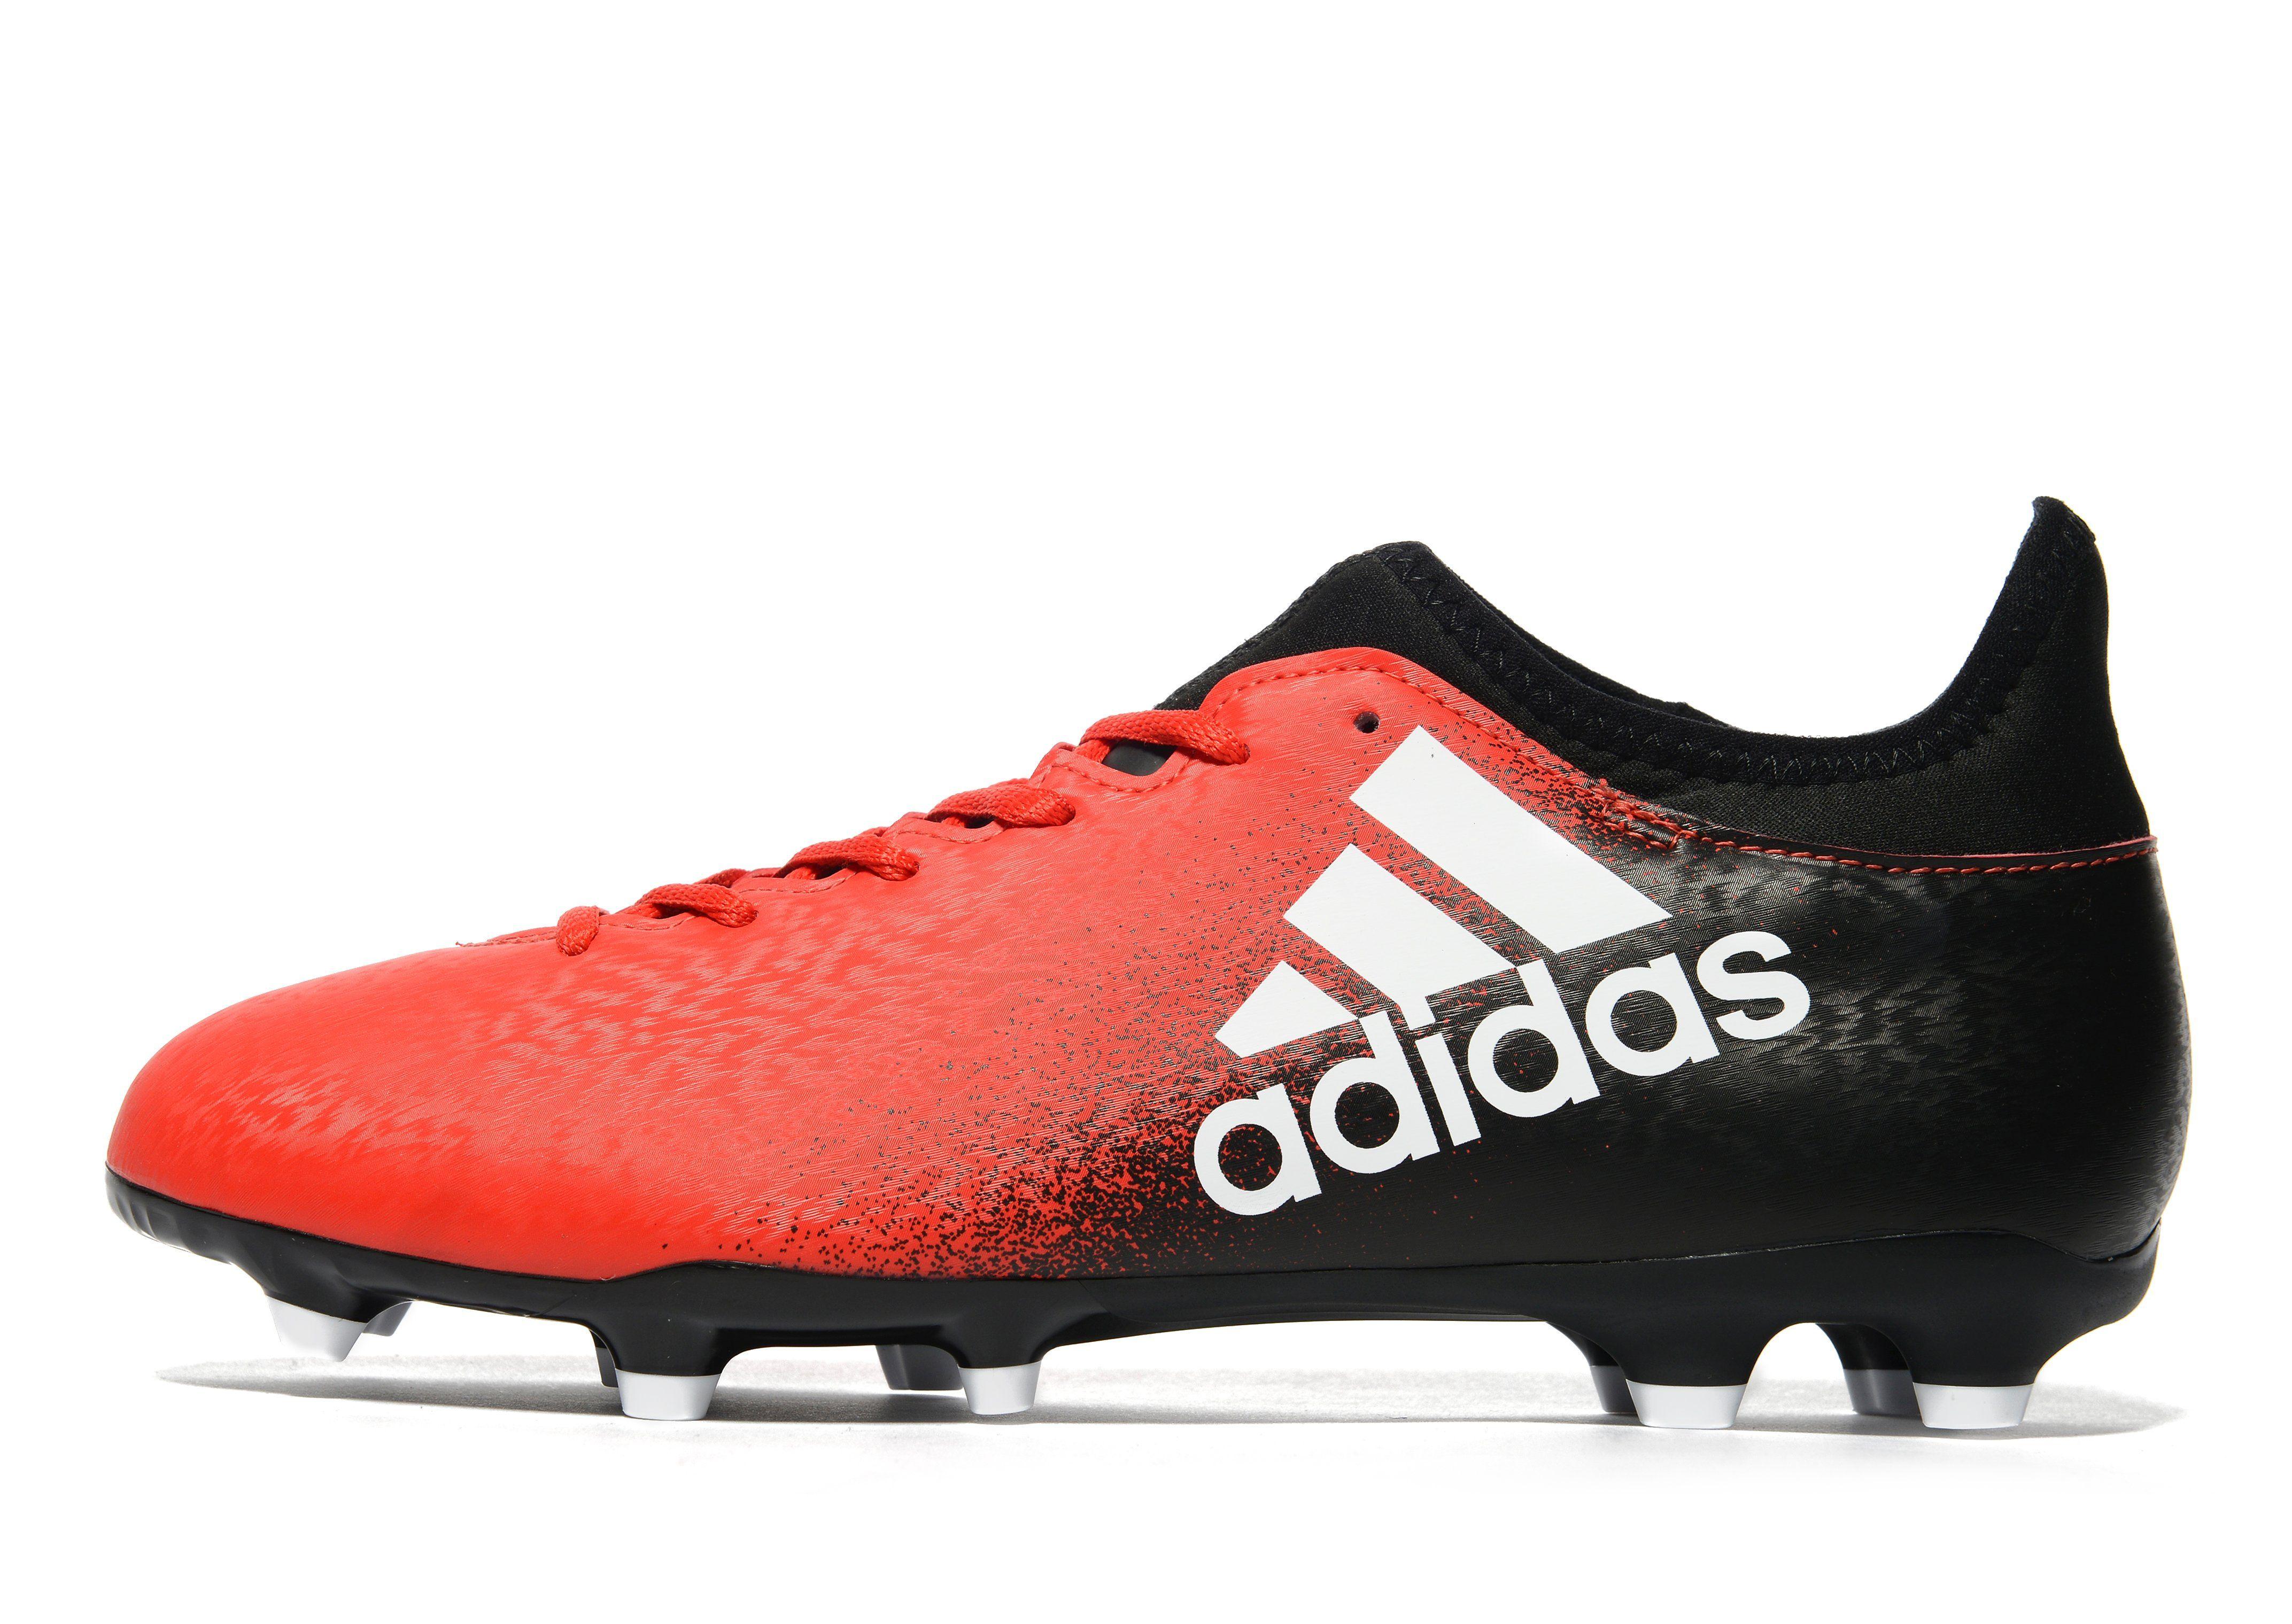 Adidas Shoes Football Boots